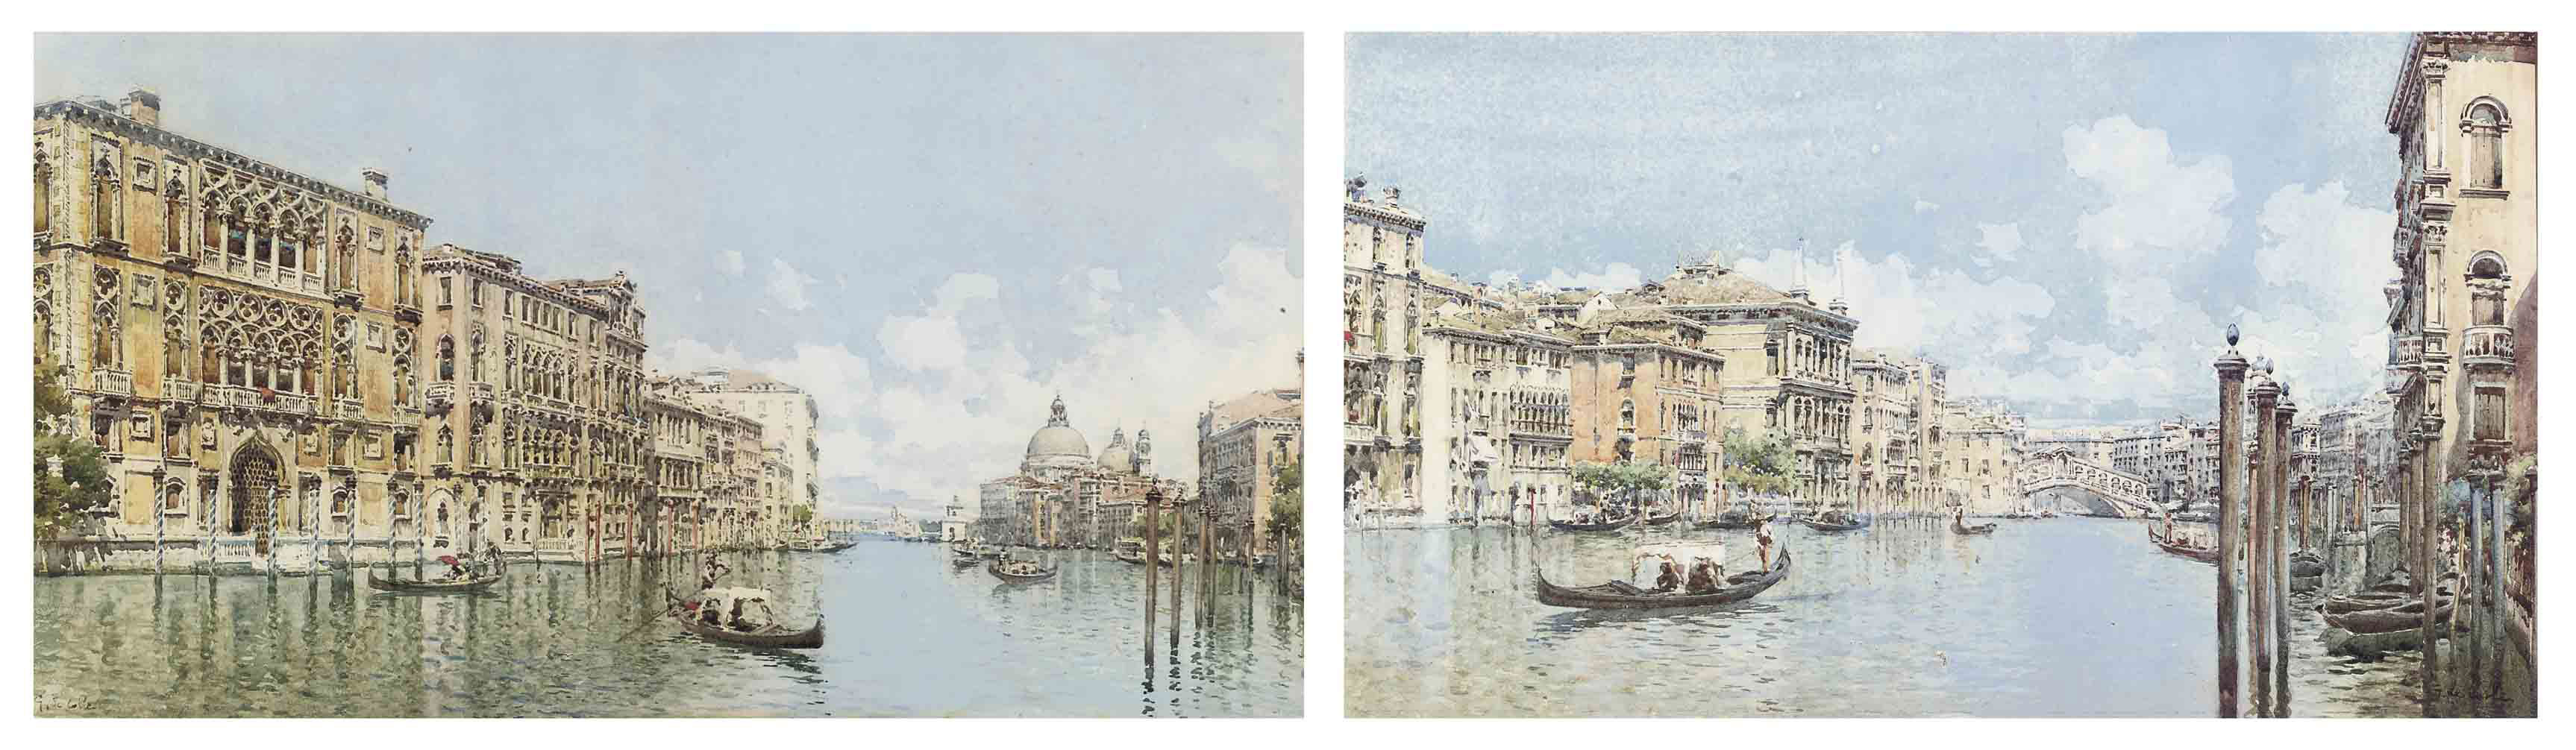 Gondolas on the Grand Canal before Santa Maria della Salute; and On the Grand Canel before the Rialto bridge, Venice